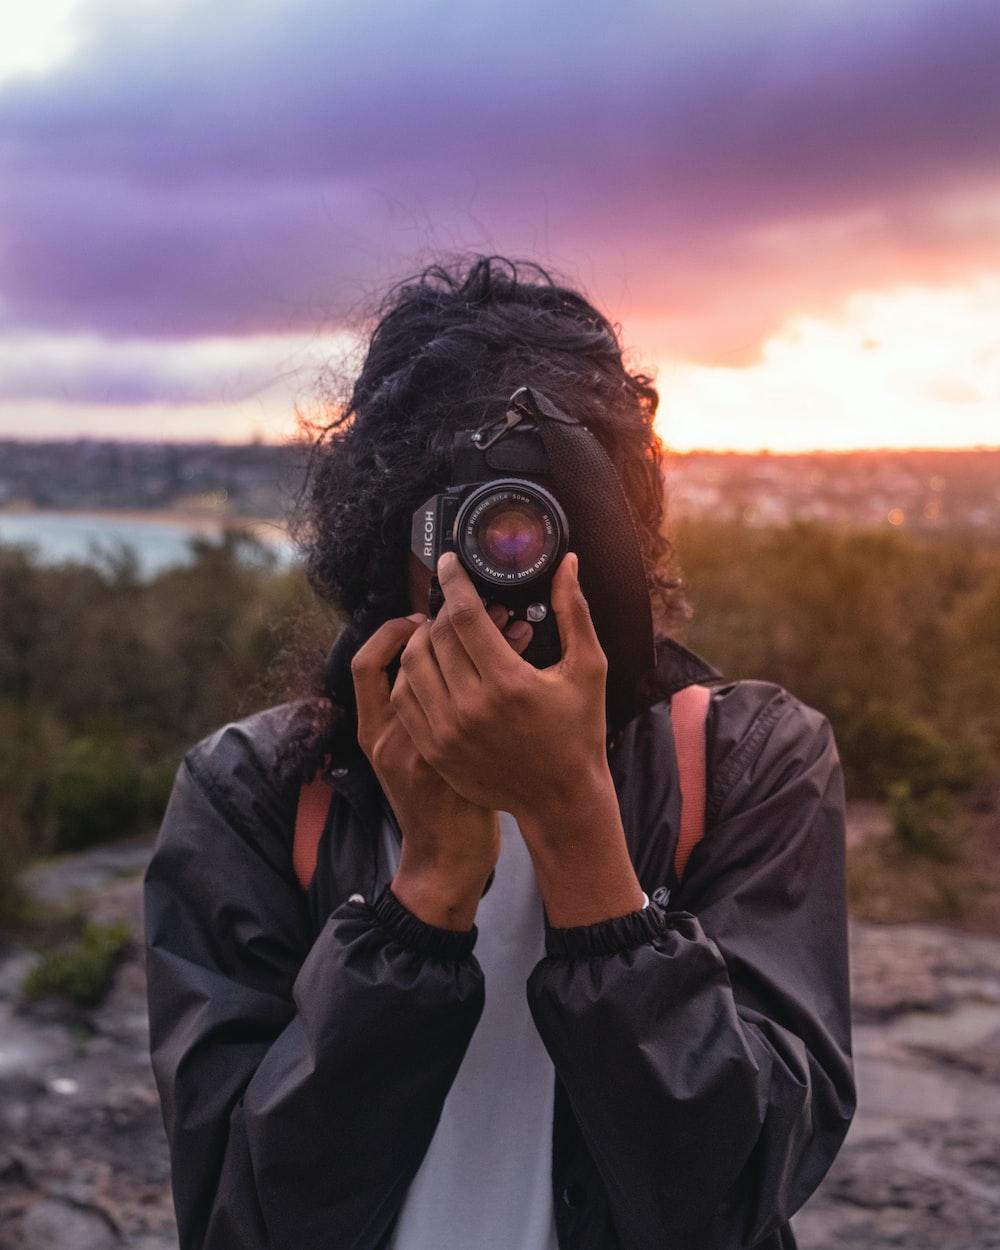 person wearing black jacket taking picture using DSLR camera